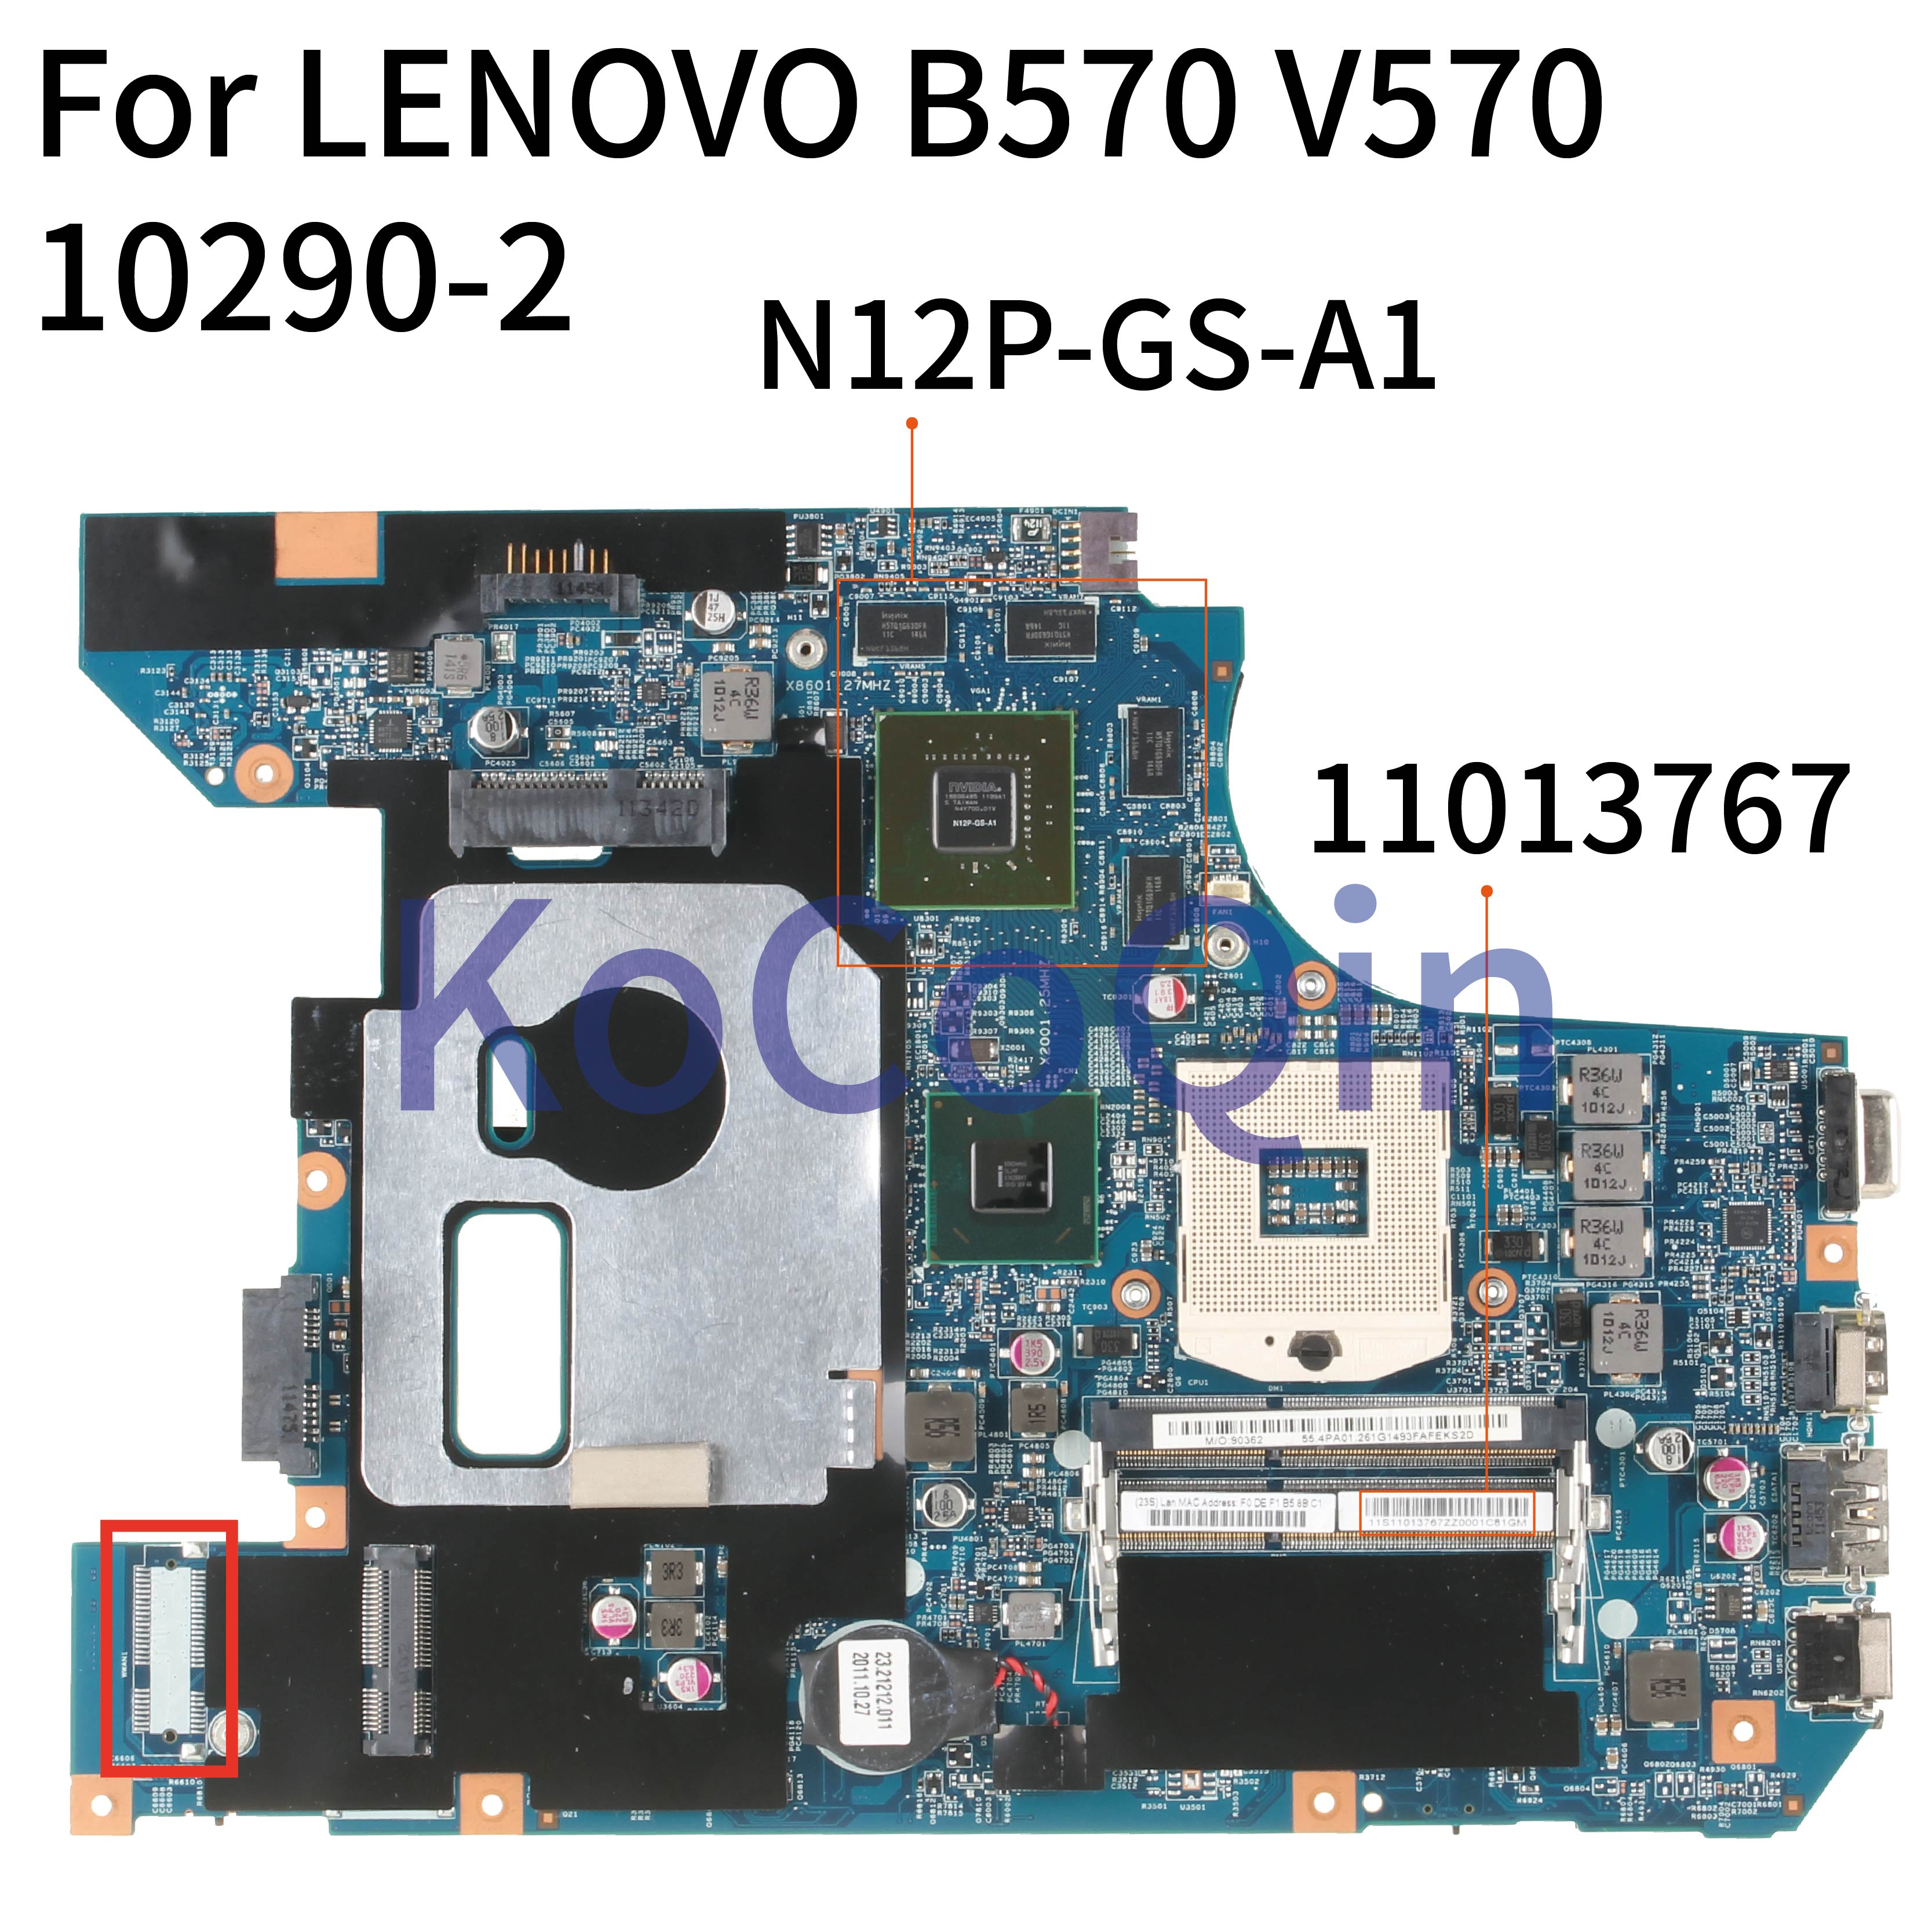 KoCoQin اللوحة المحمول لينوفو Z570 GT540M 2GB HM65 اللوحة 10290-248.4PA01.021 11013767 N12P-GS-A1